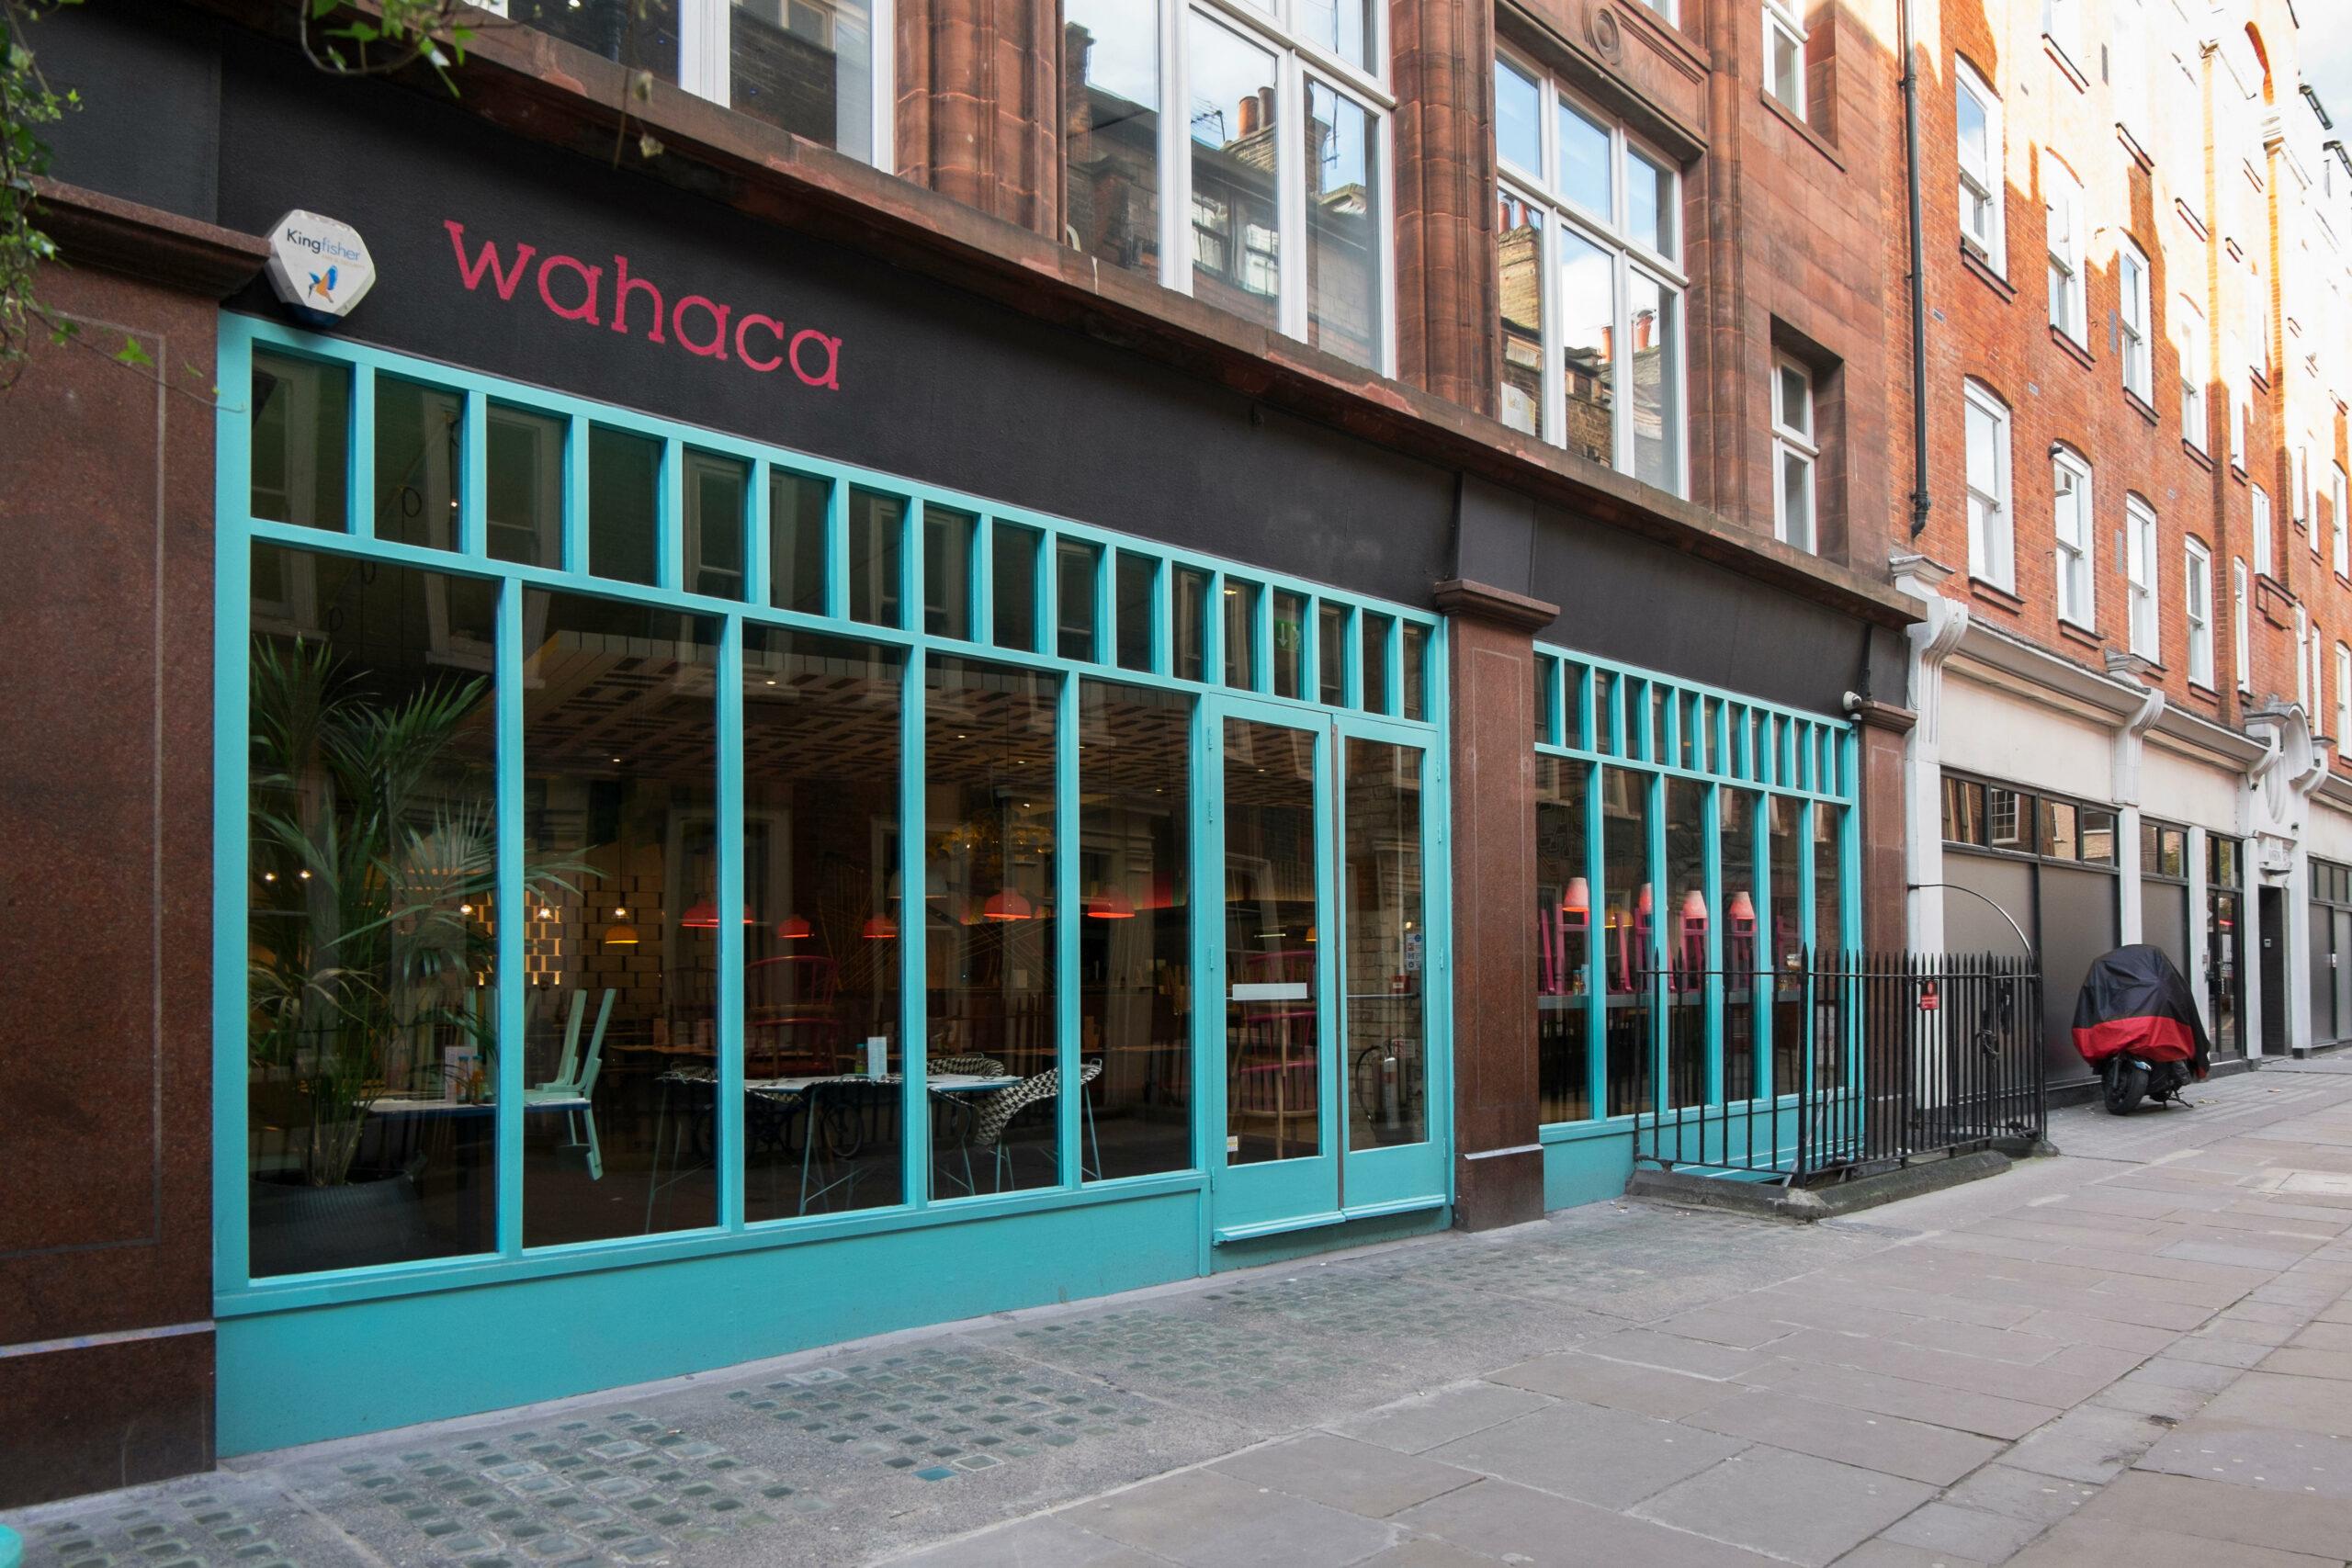 Wahaca restaurant closures